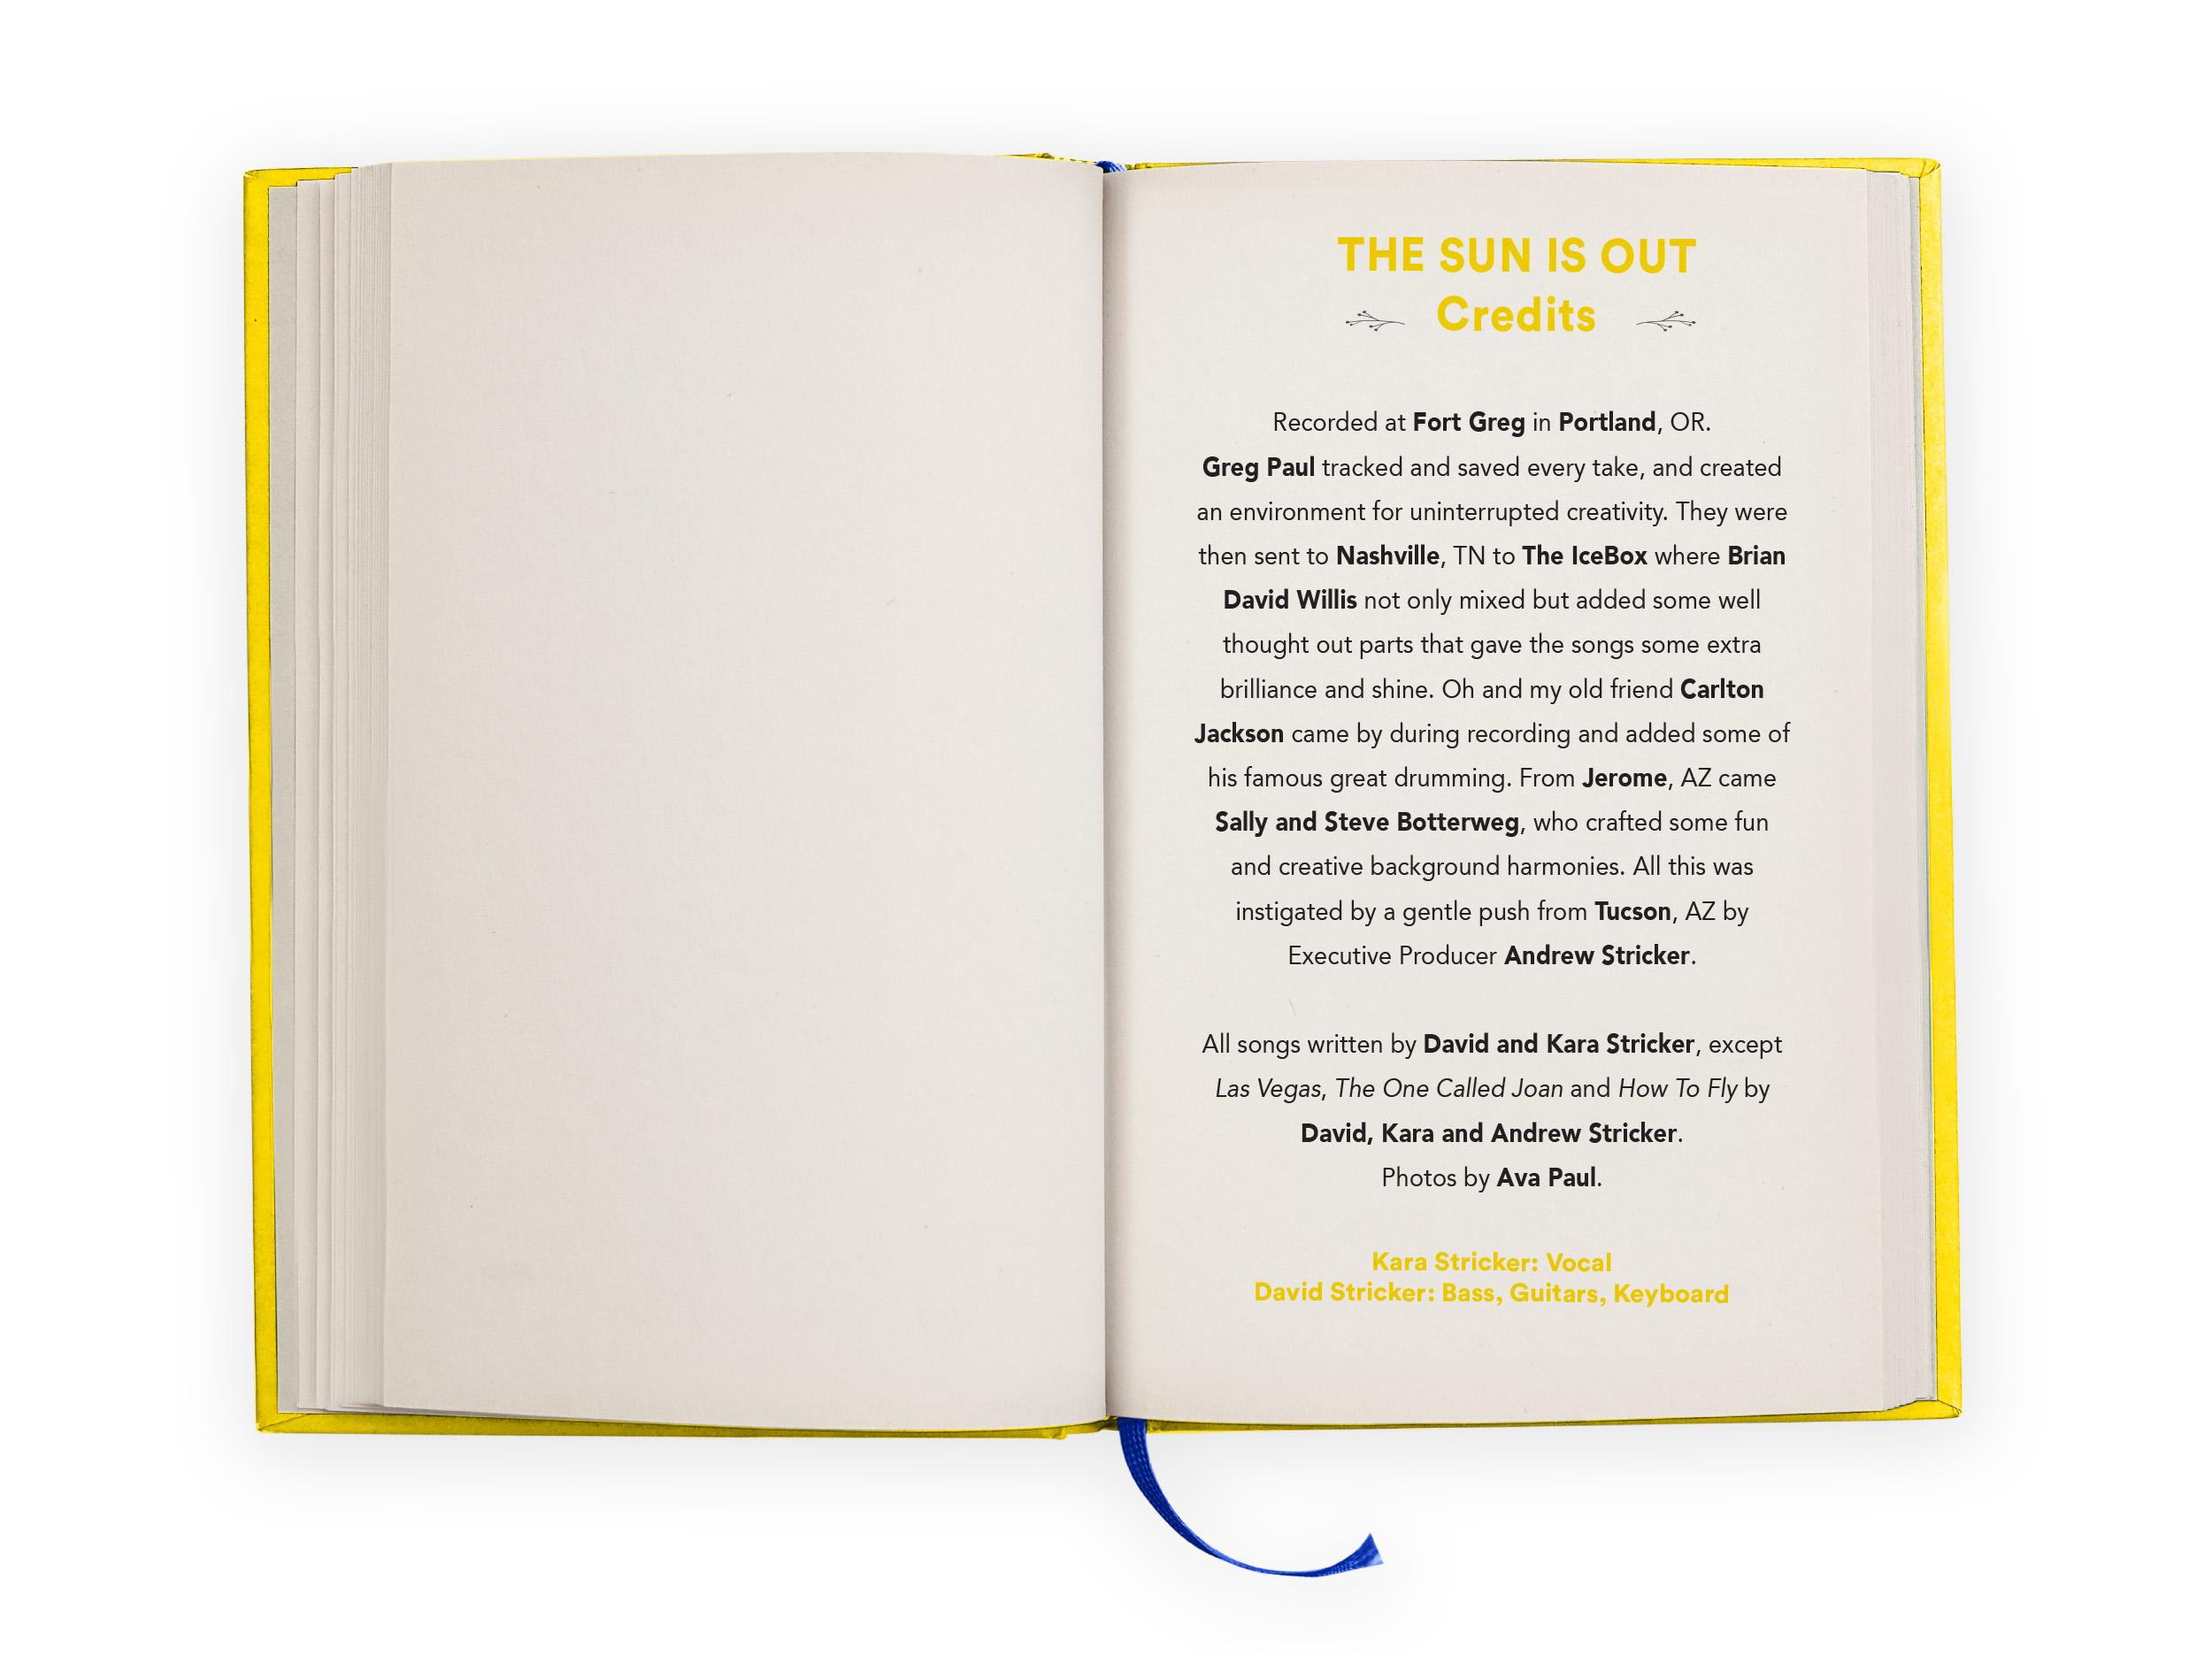 Book_10_Credits.jpg